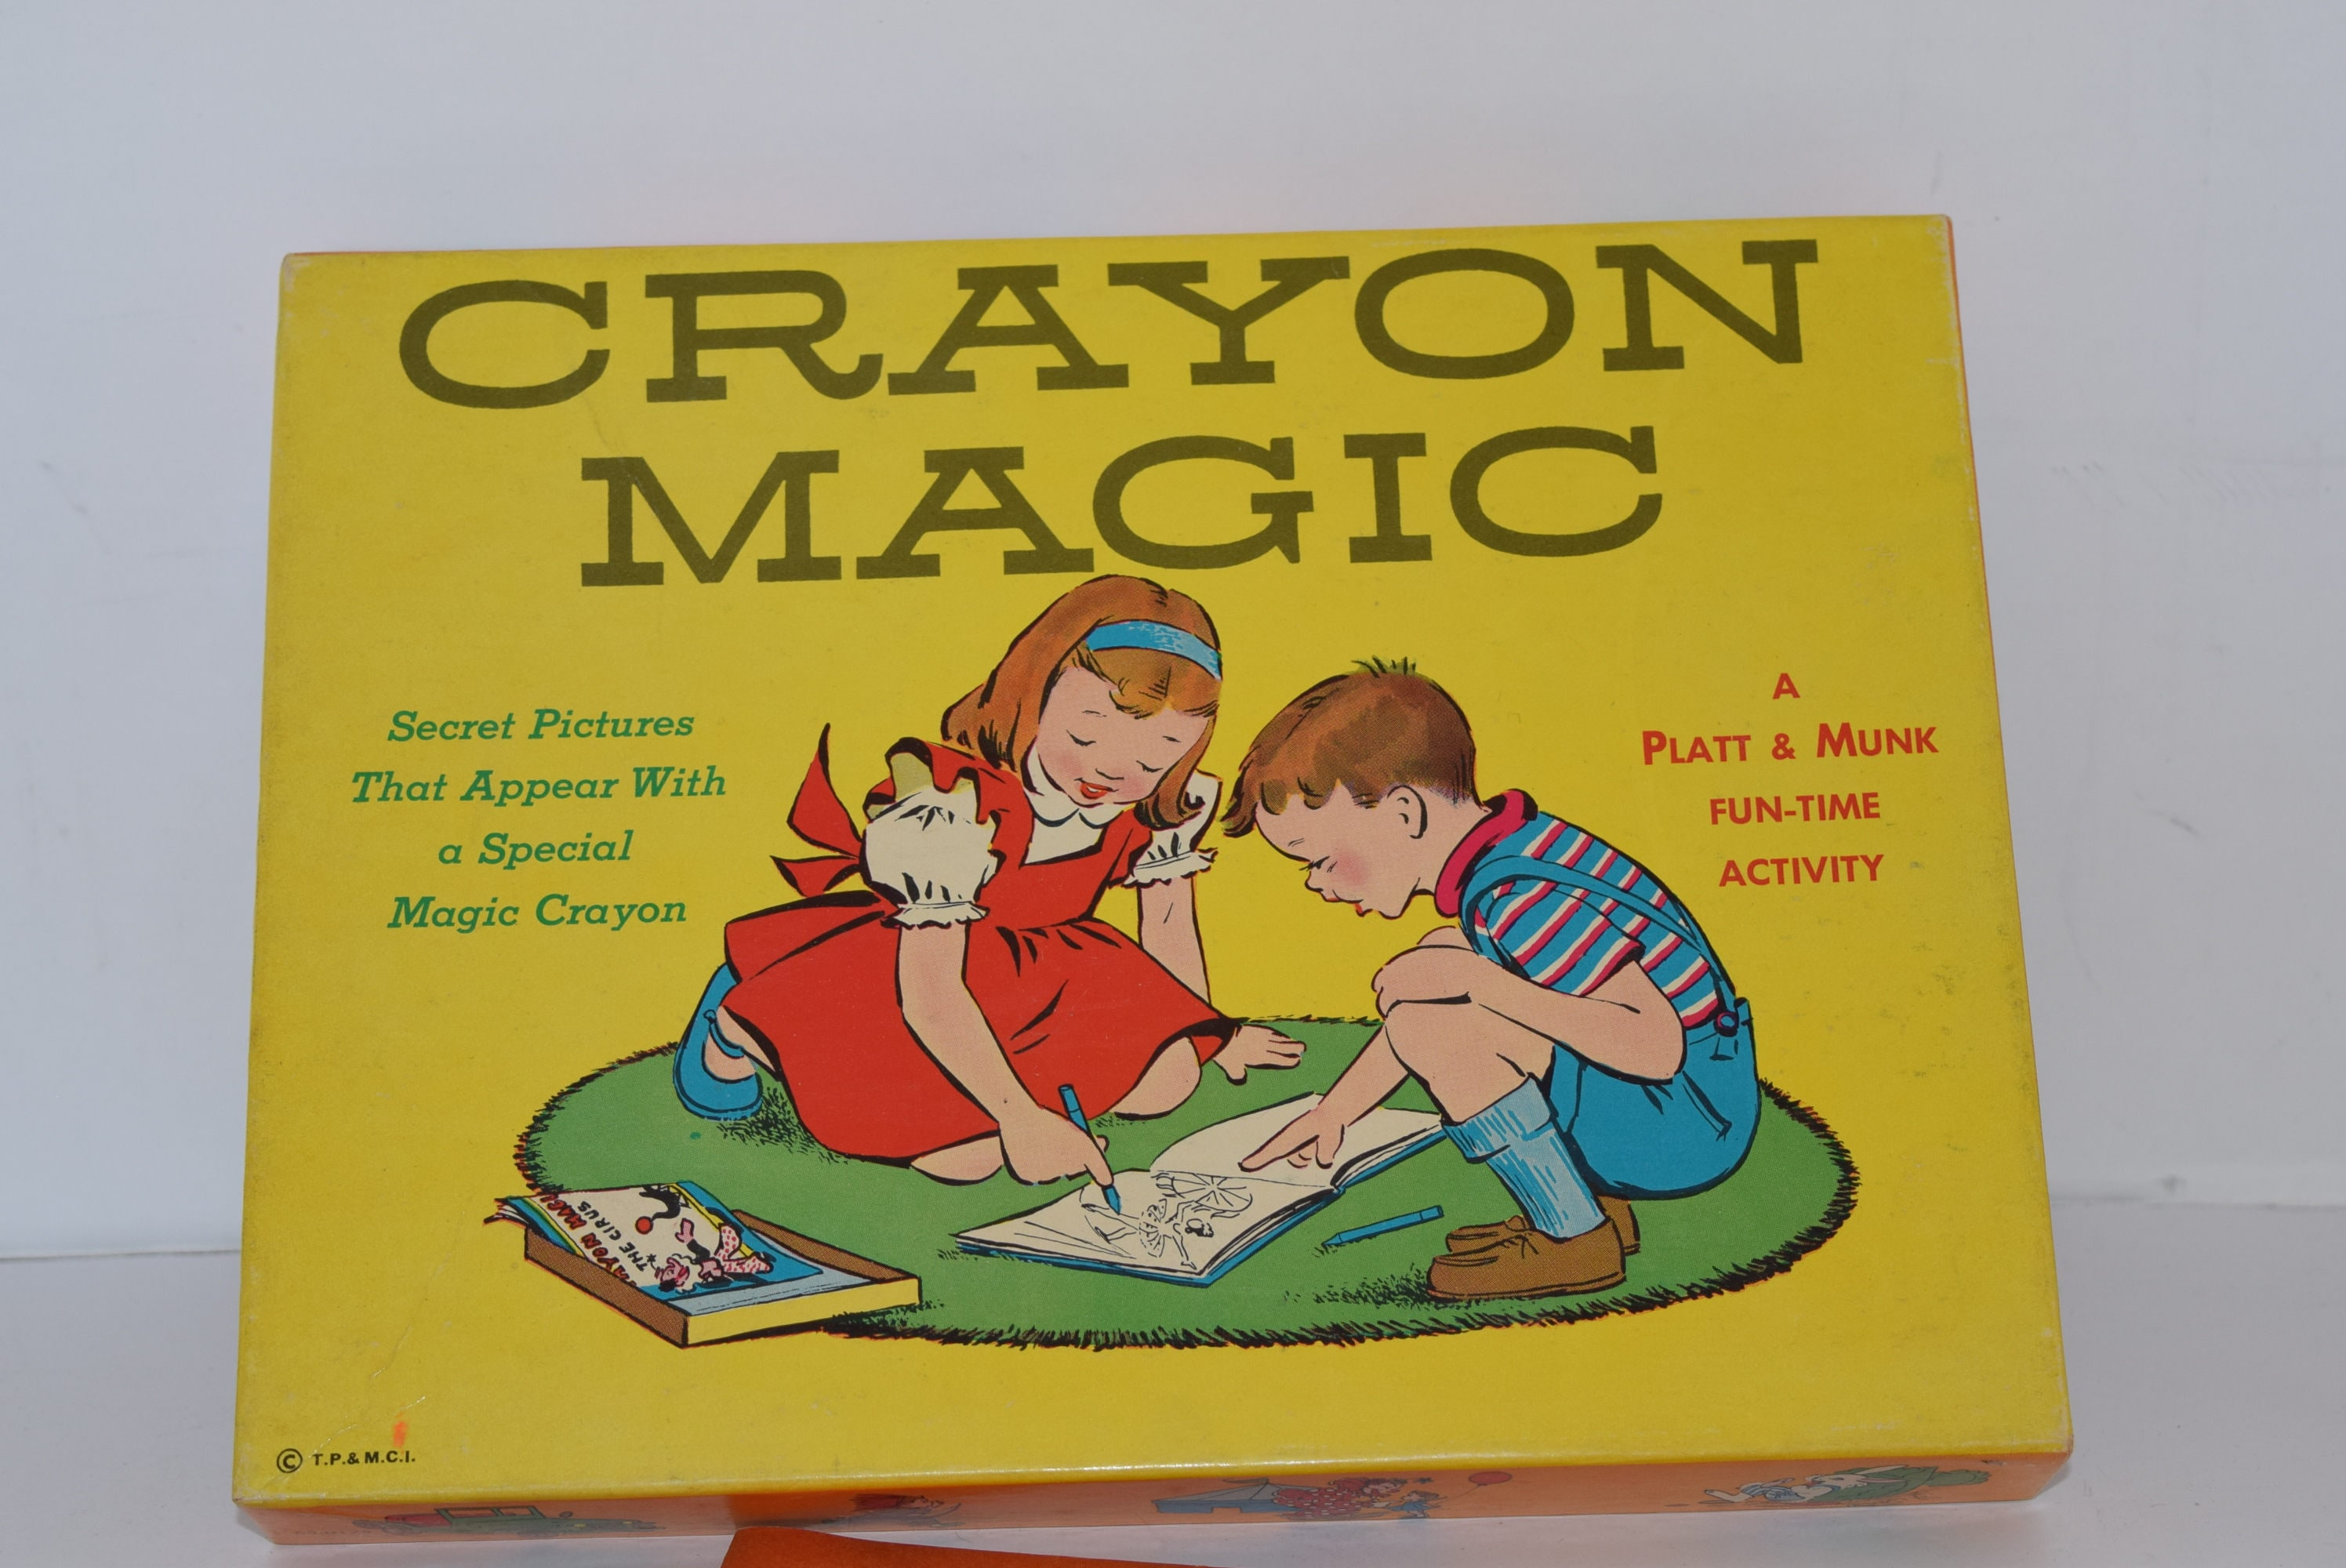 Vintage 1959 Platt and Munks Co. Crayon Magic Coloring Books Set